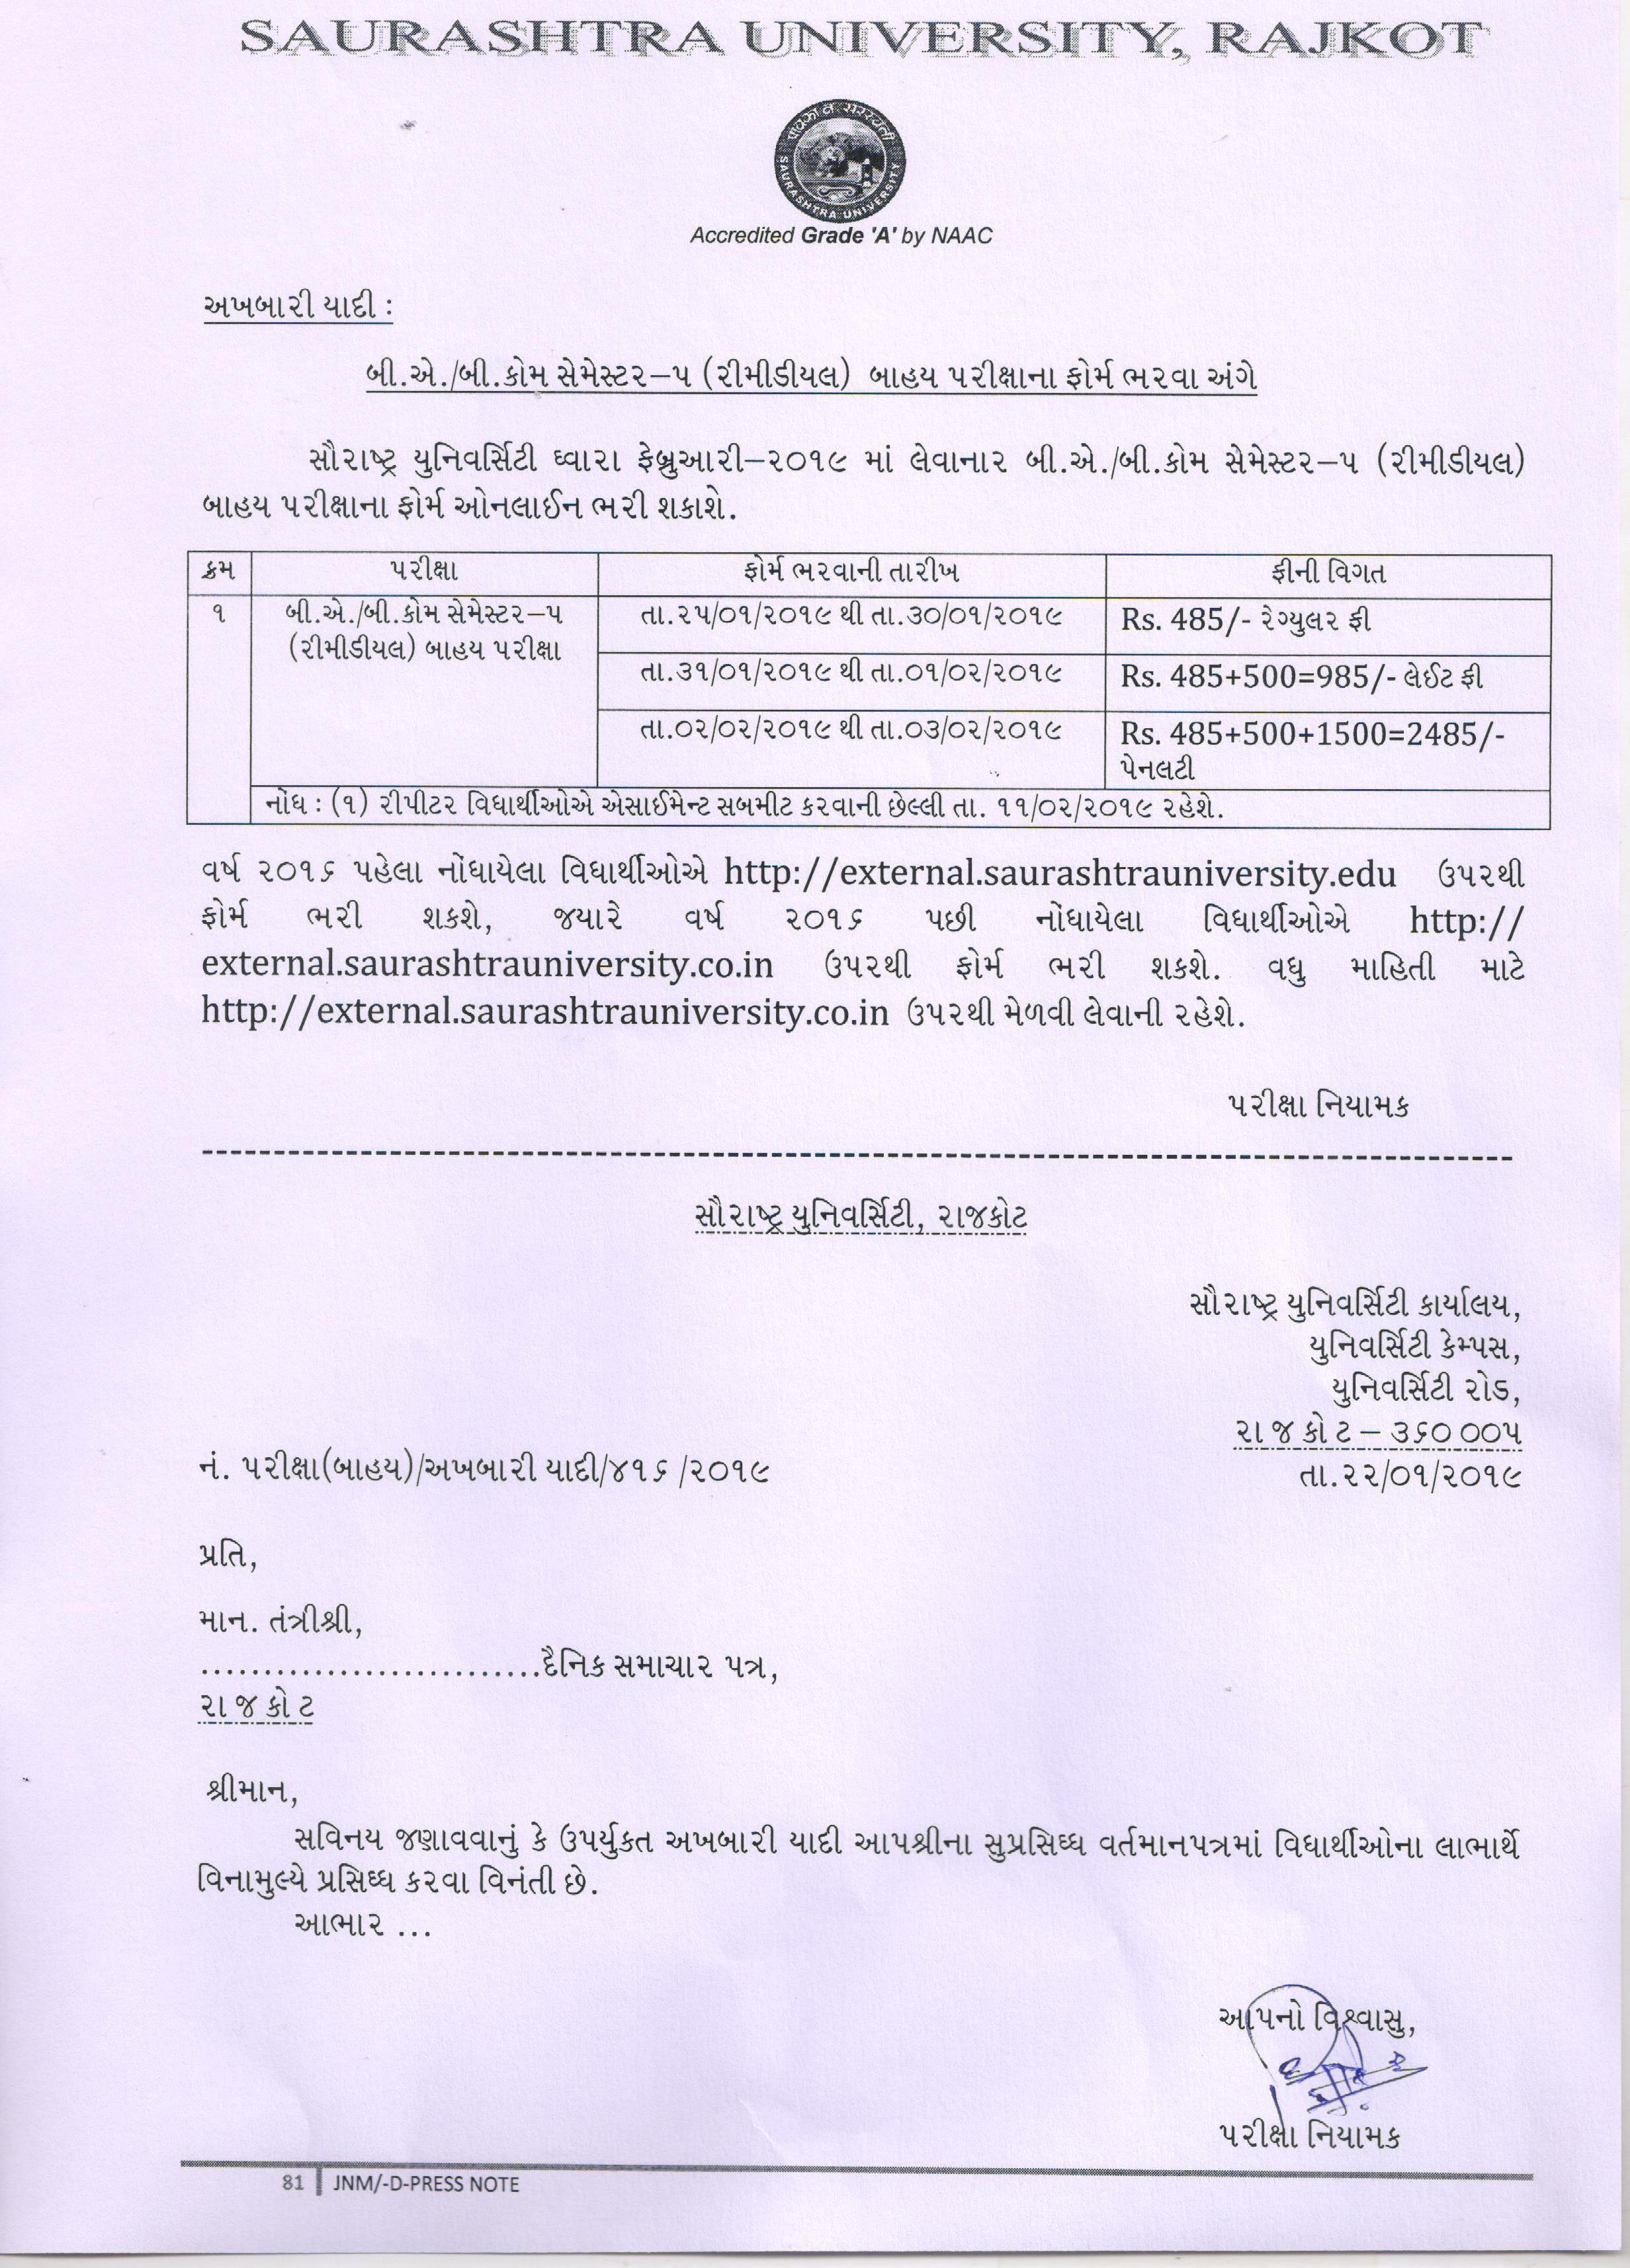 Saurashtra University - Campus Management System